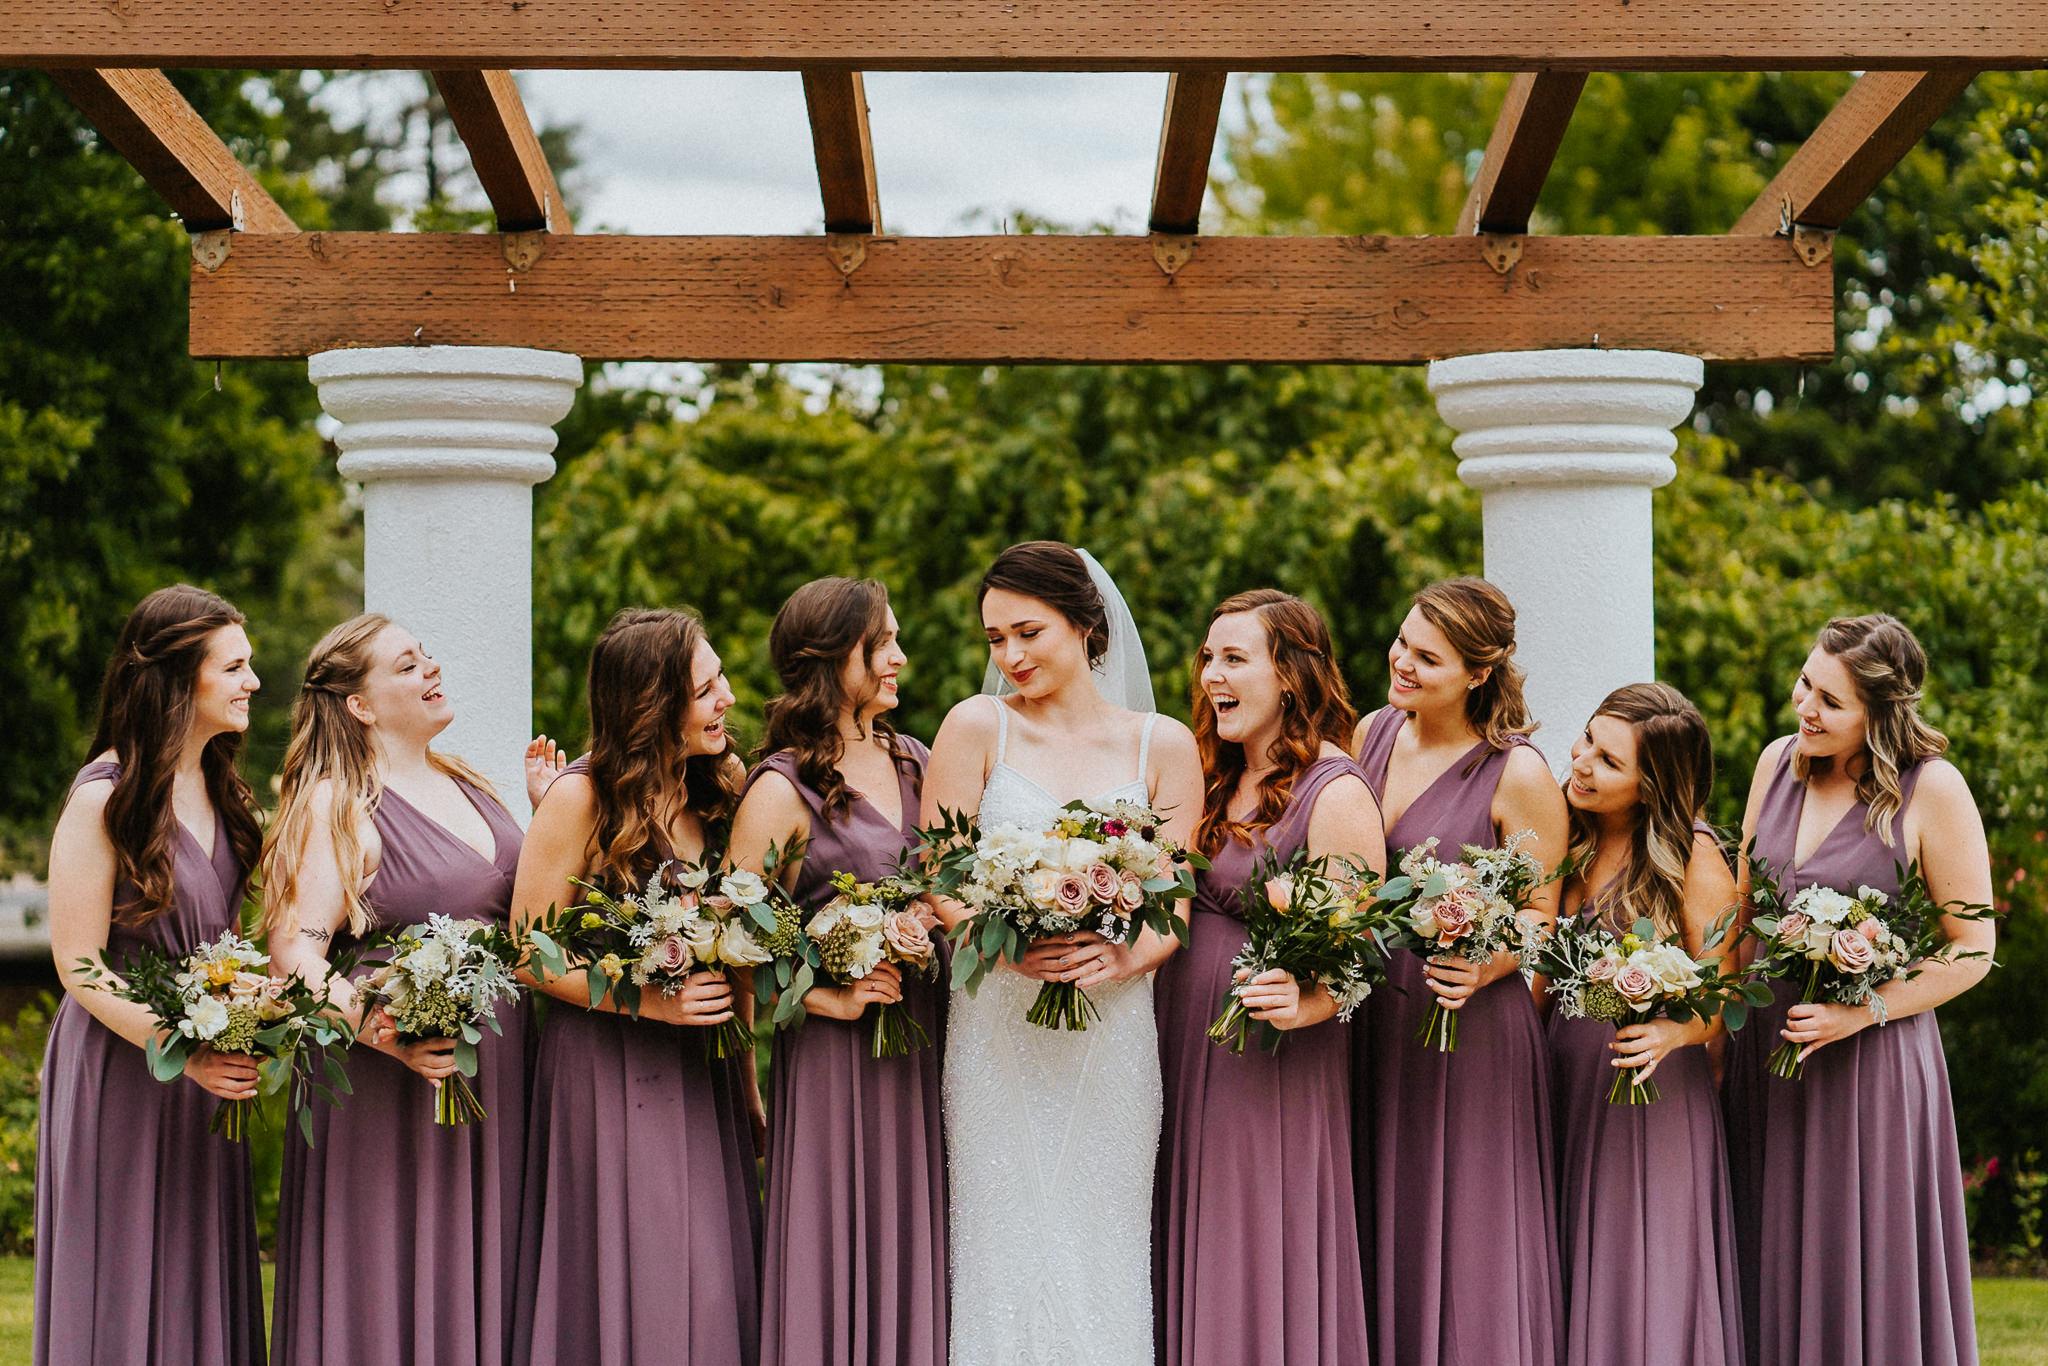 Bride Bridesmaid Purple Dress Truevinefloral Alfred Tang Weddings